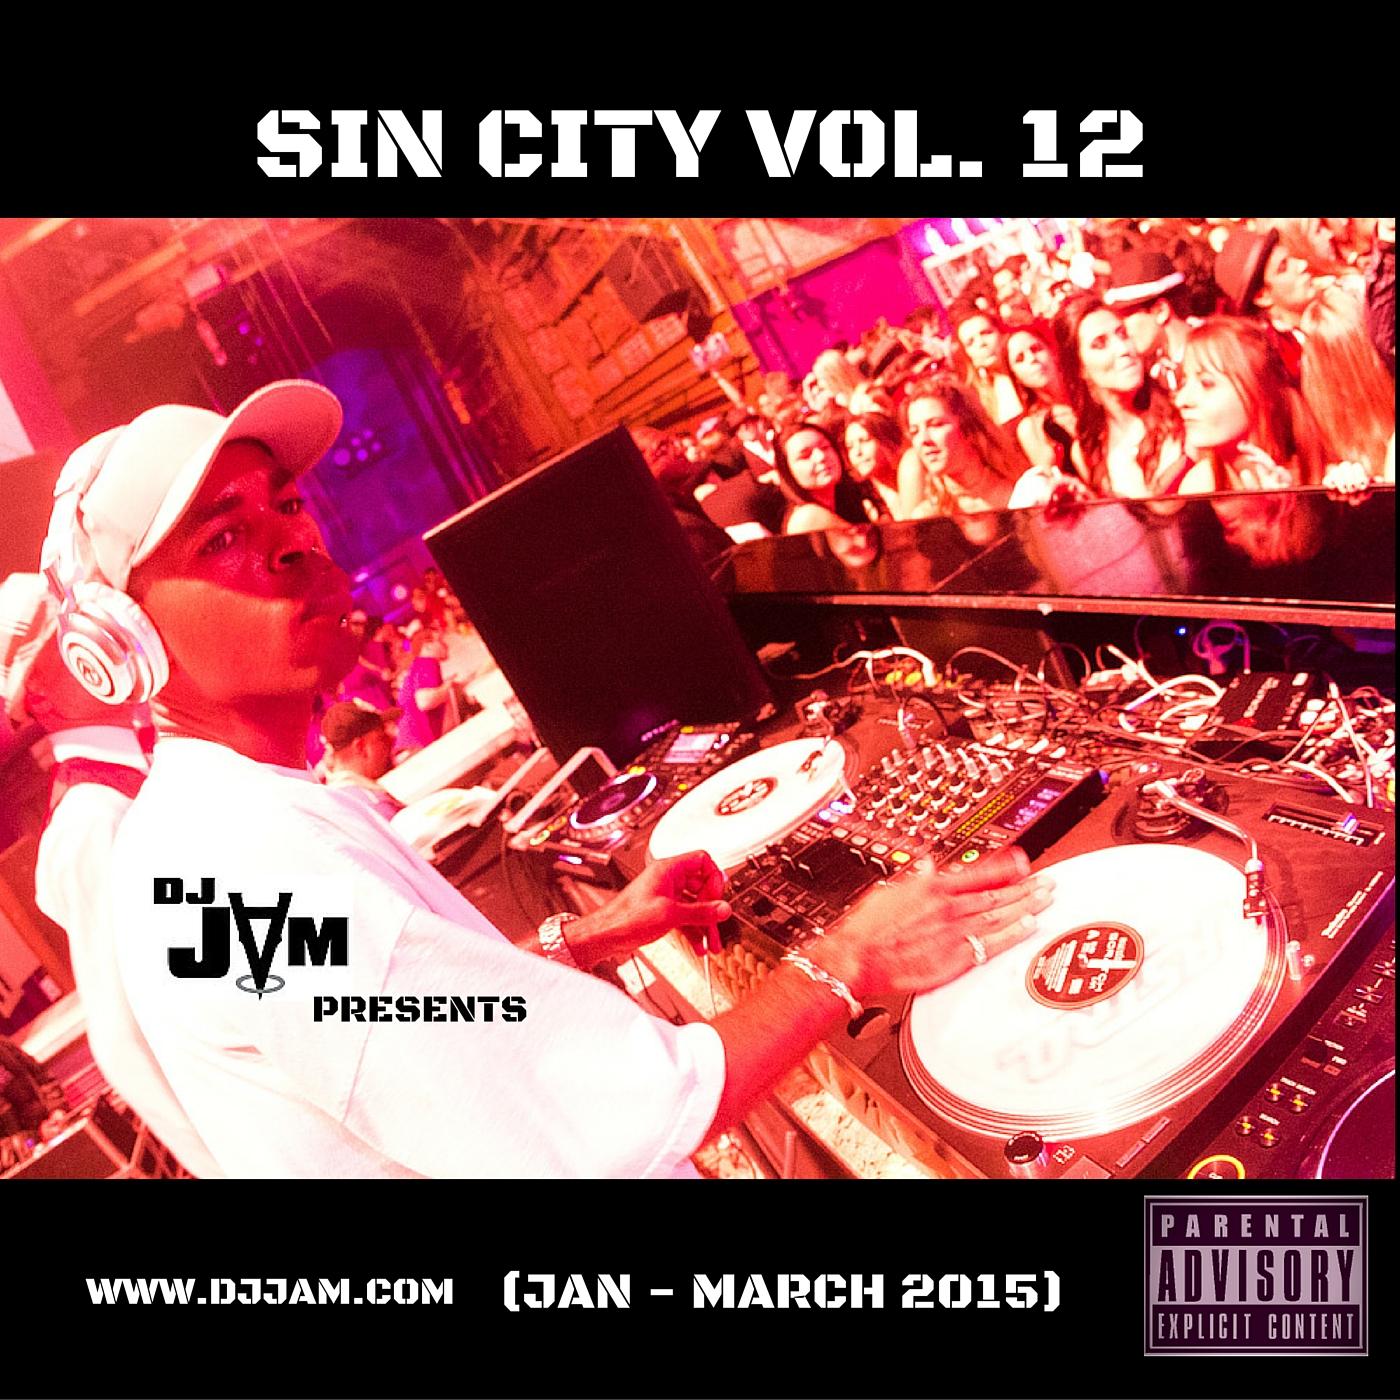 """NEW MUSIC"" Sin City Vol. 12  #DJVATICAN"